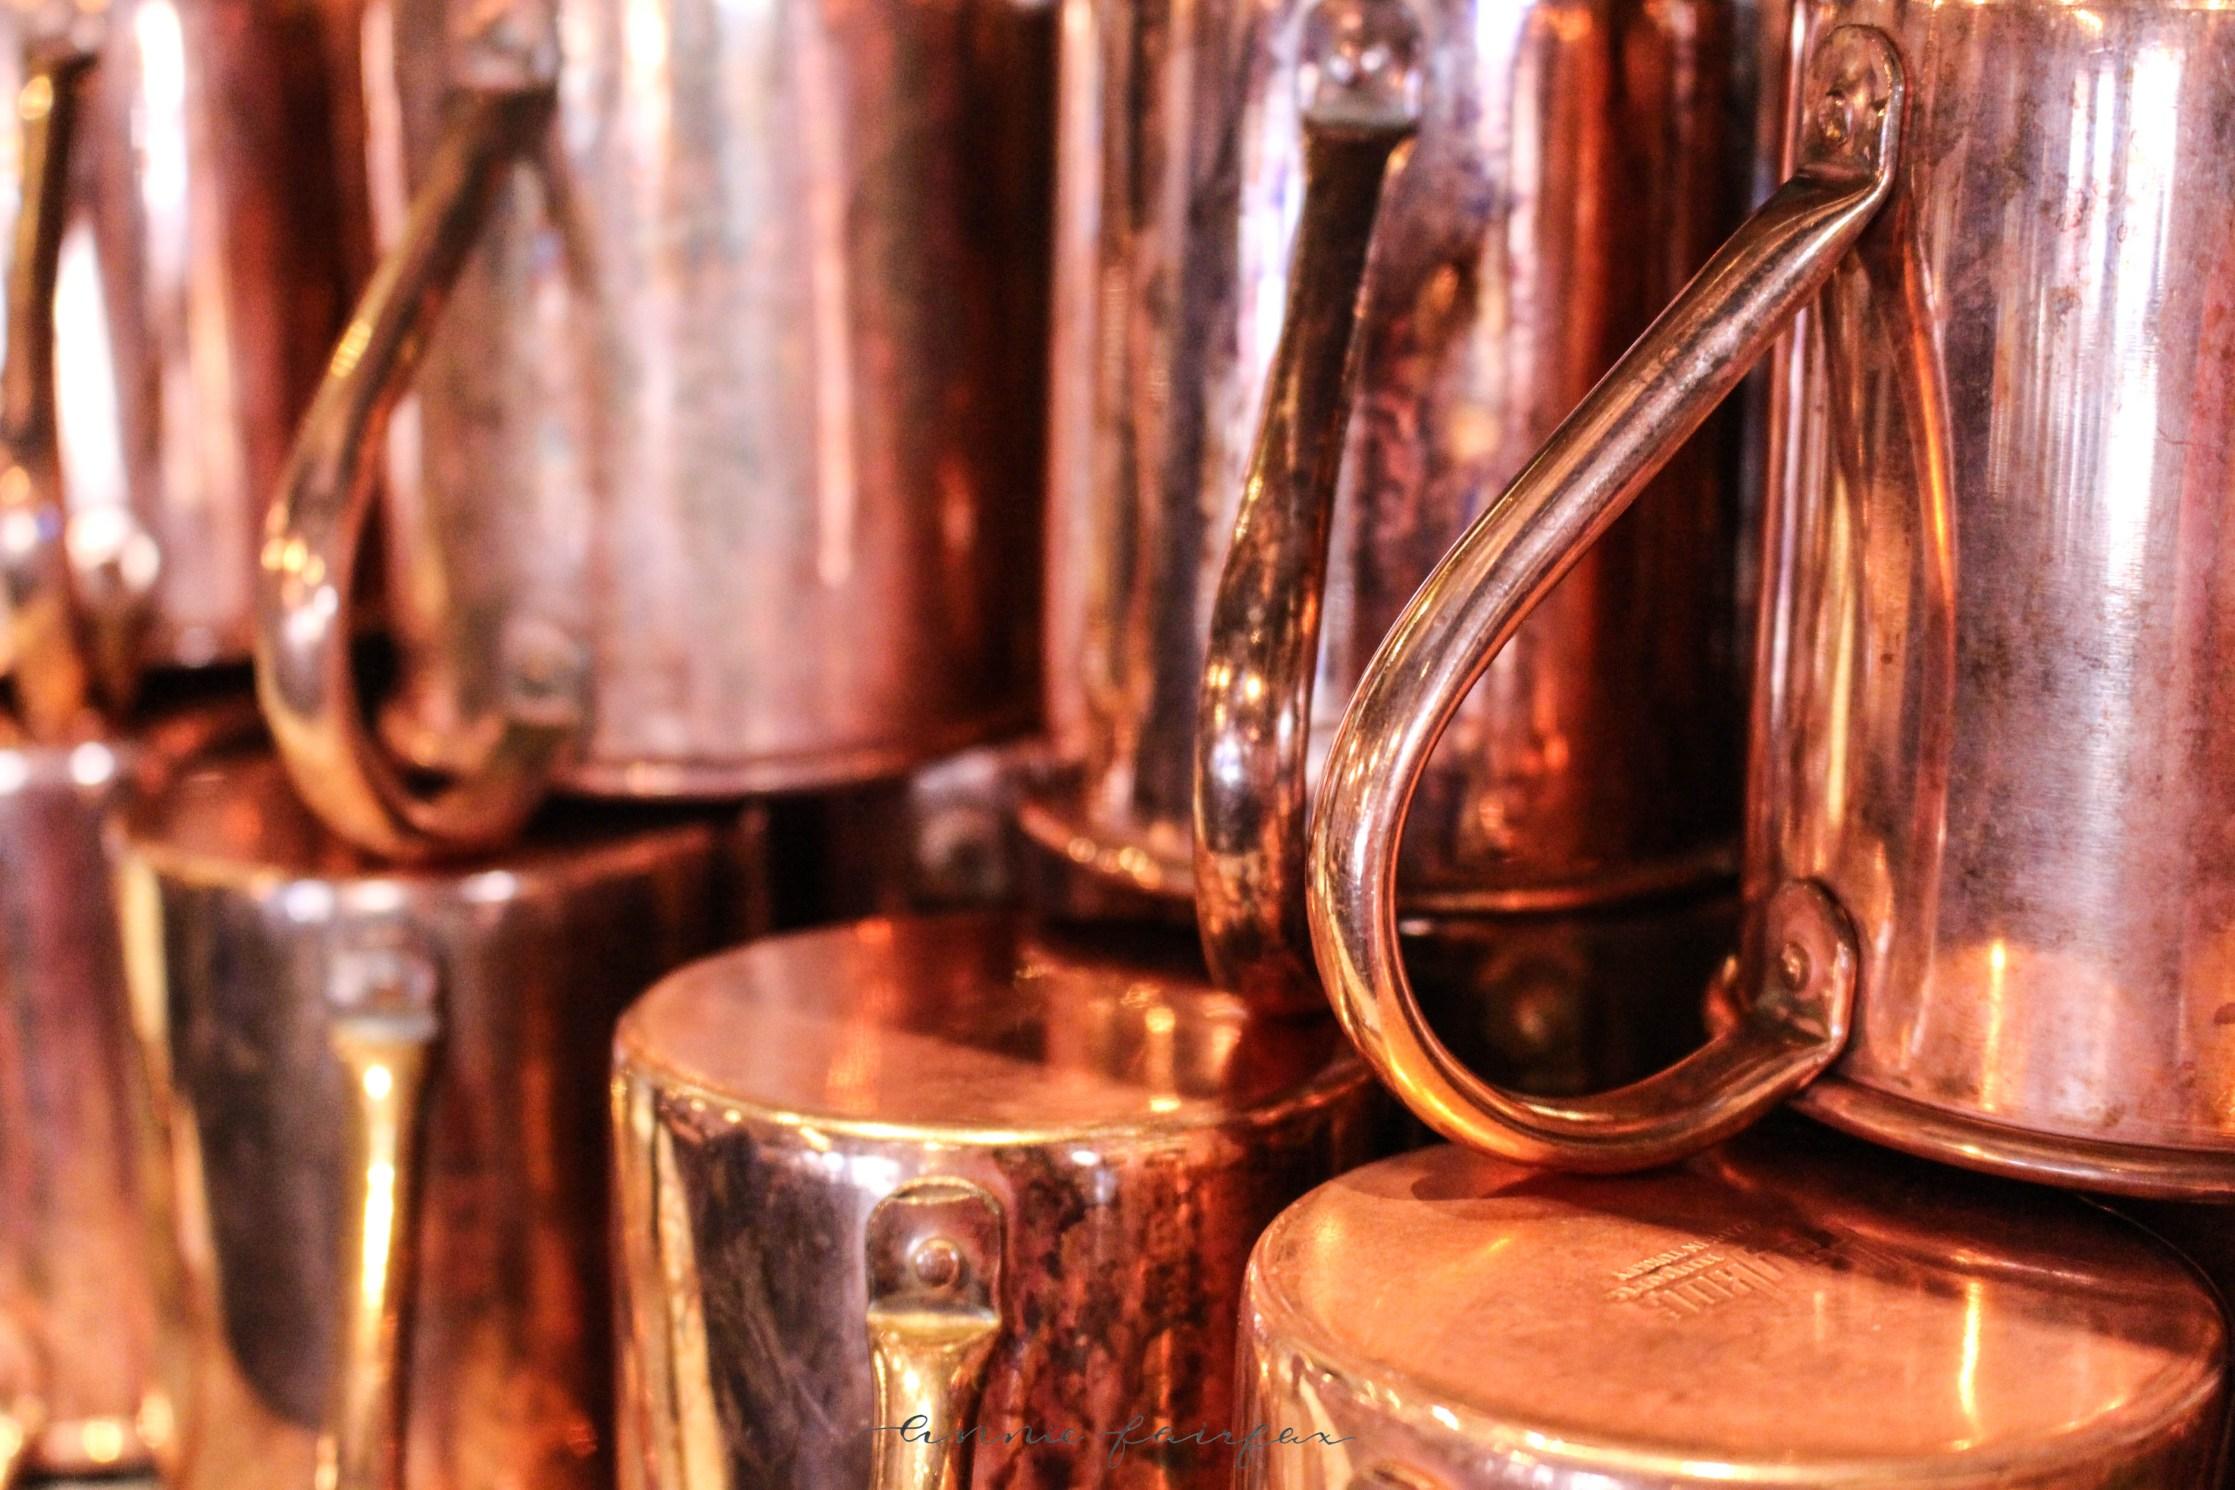 Copper Mule Mug Charcuterie Board from Prost in Frankenmuth, MI